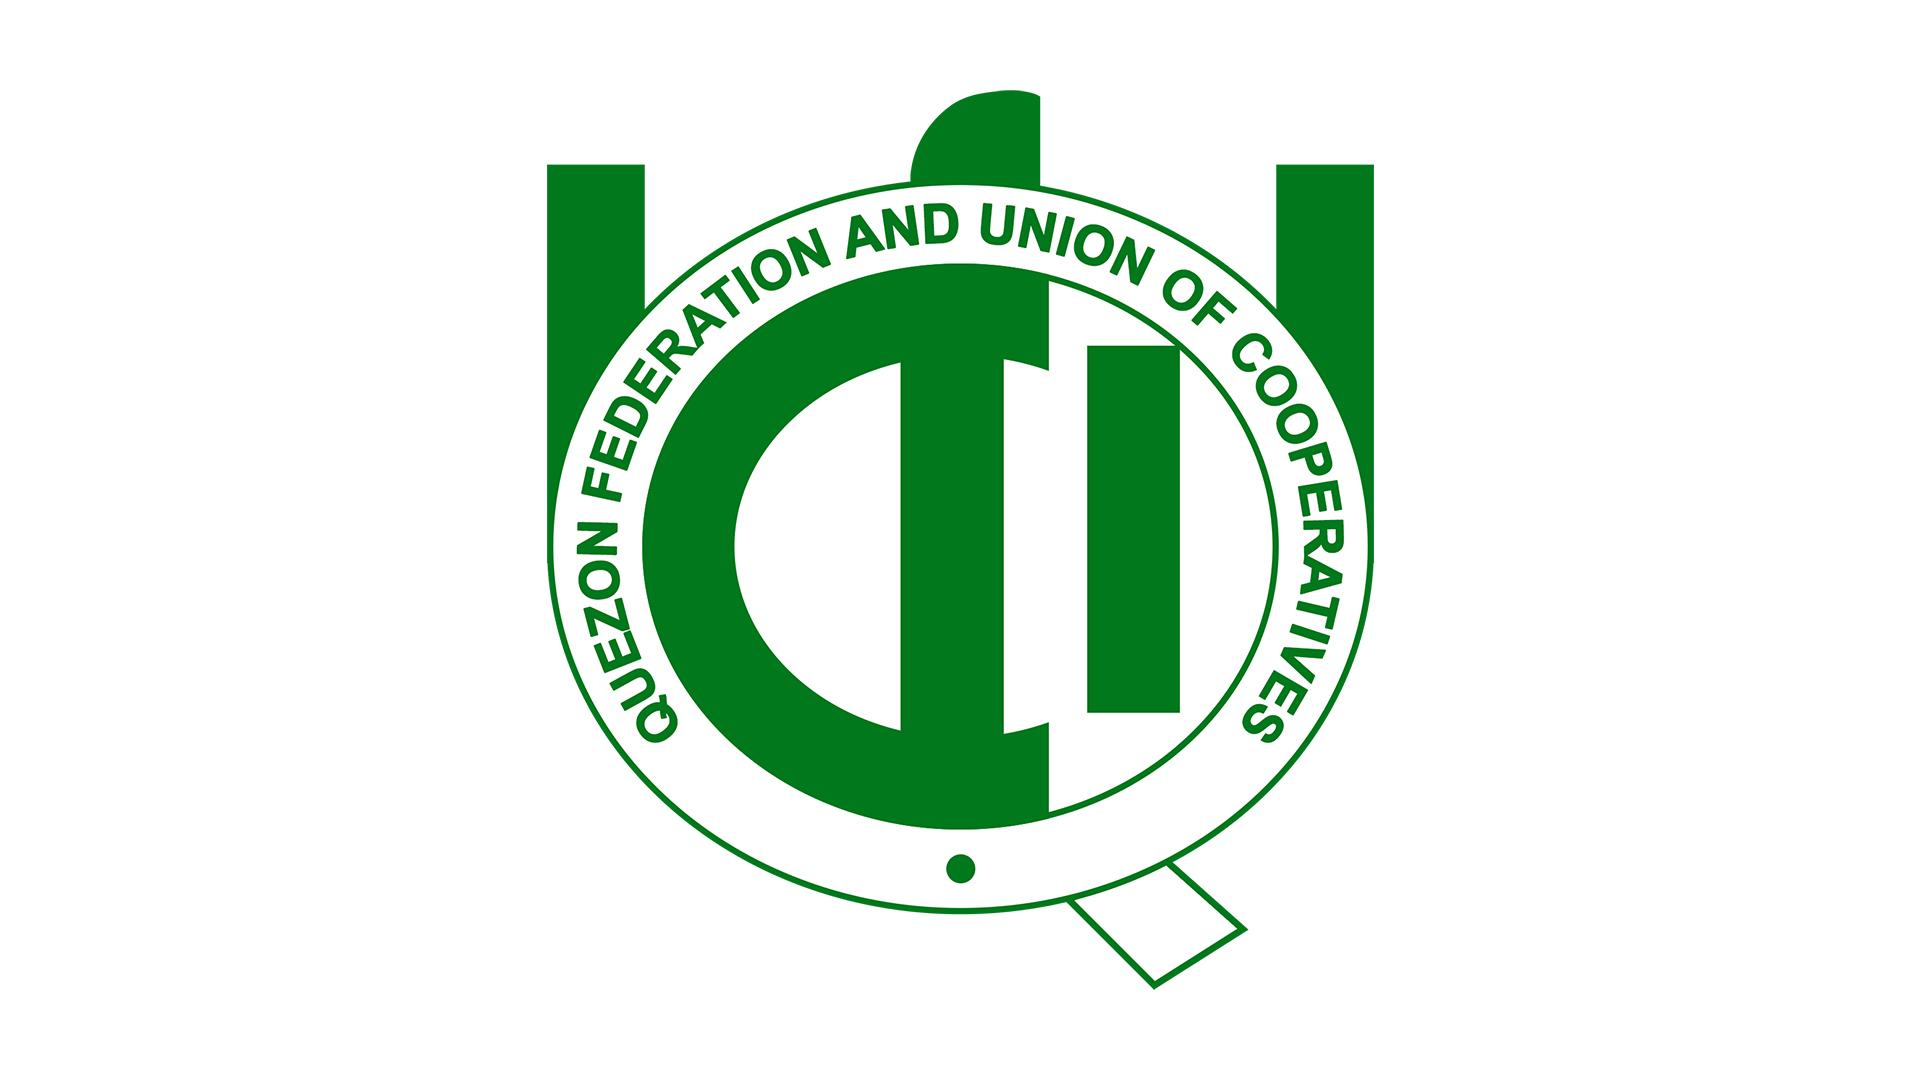 quezon federation and union of cooperati